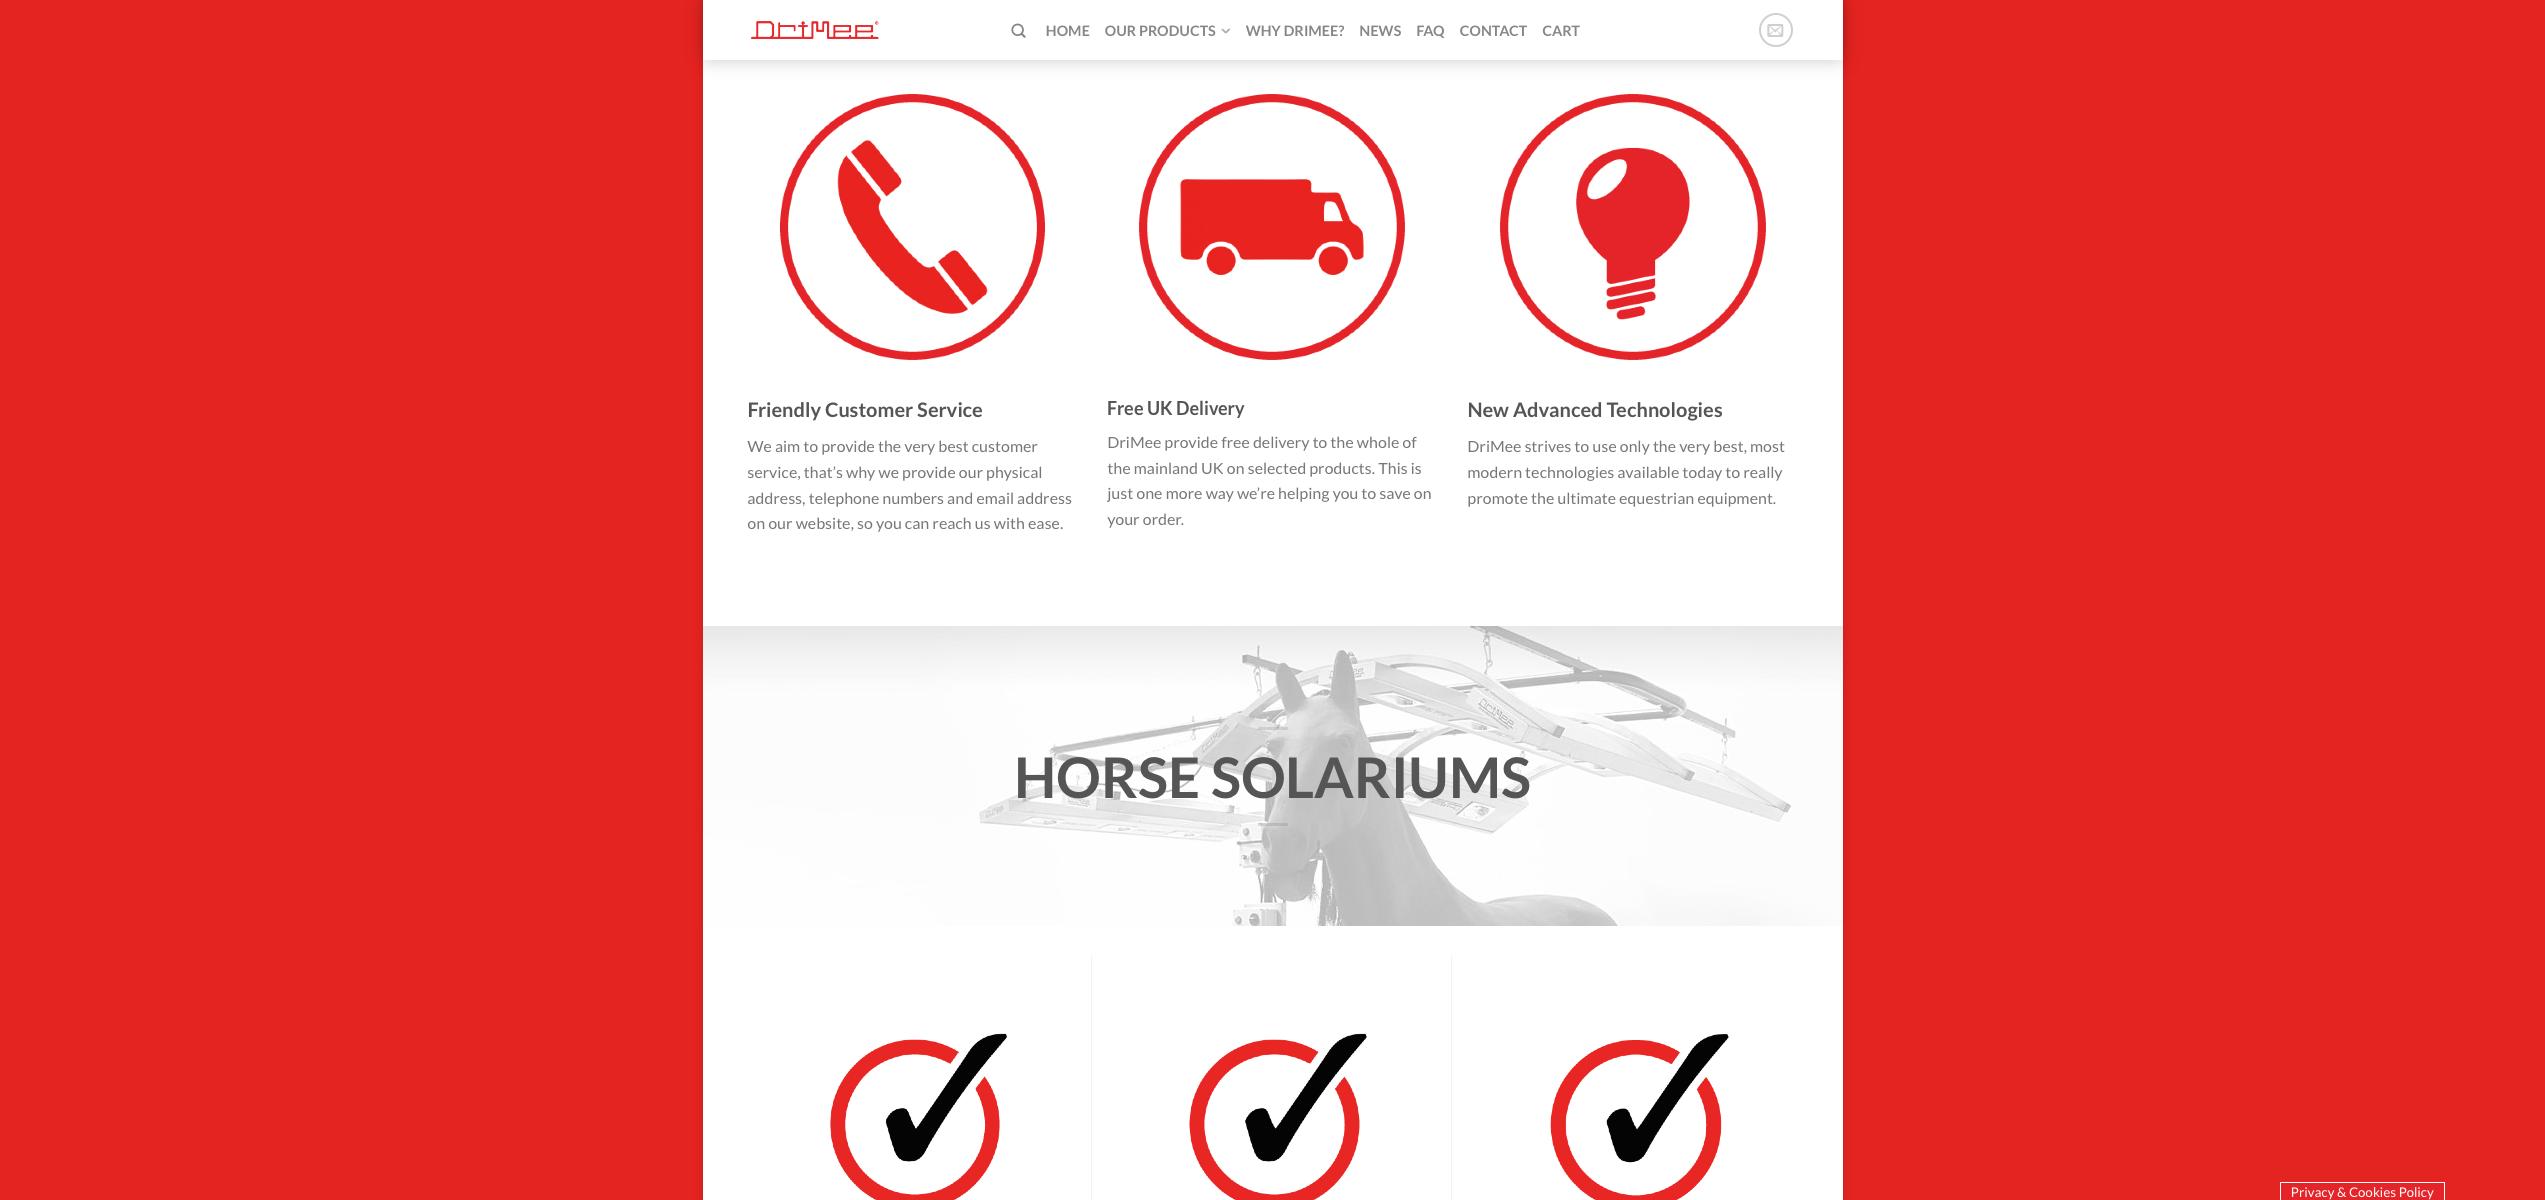 IDEA UK Design and Marketing Drimee Equestrian Horse Equipment Website Design 14